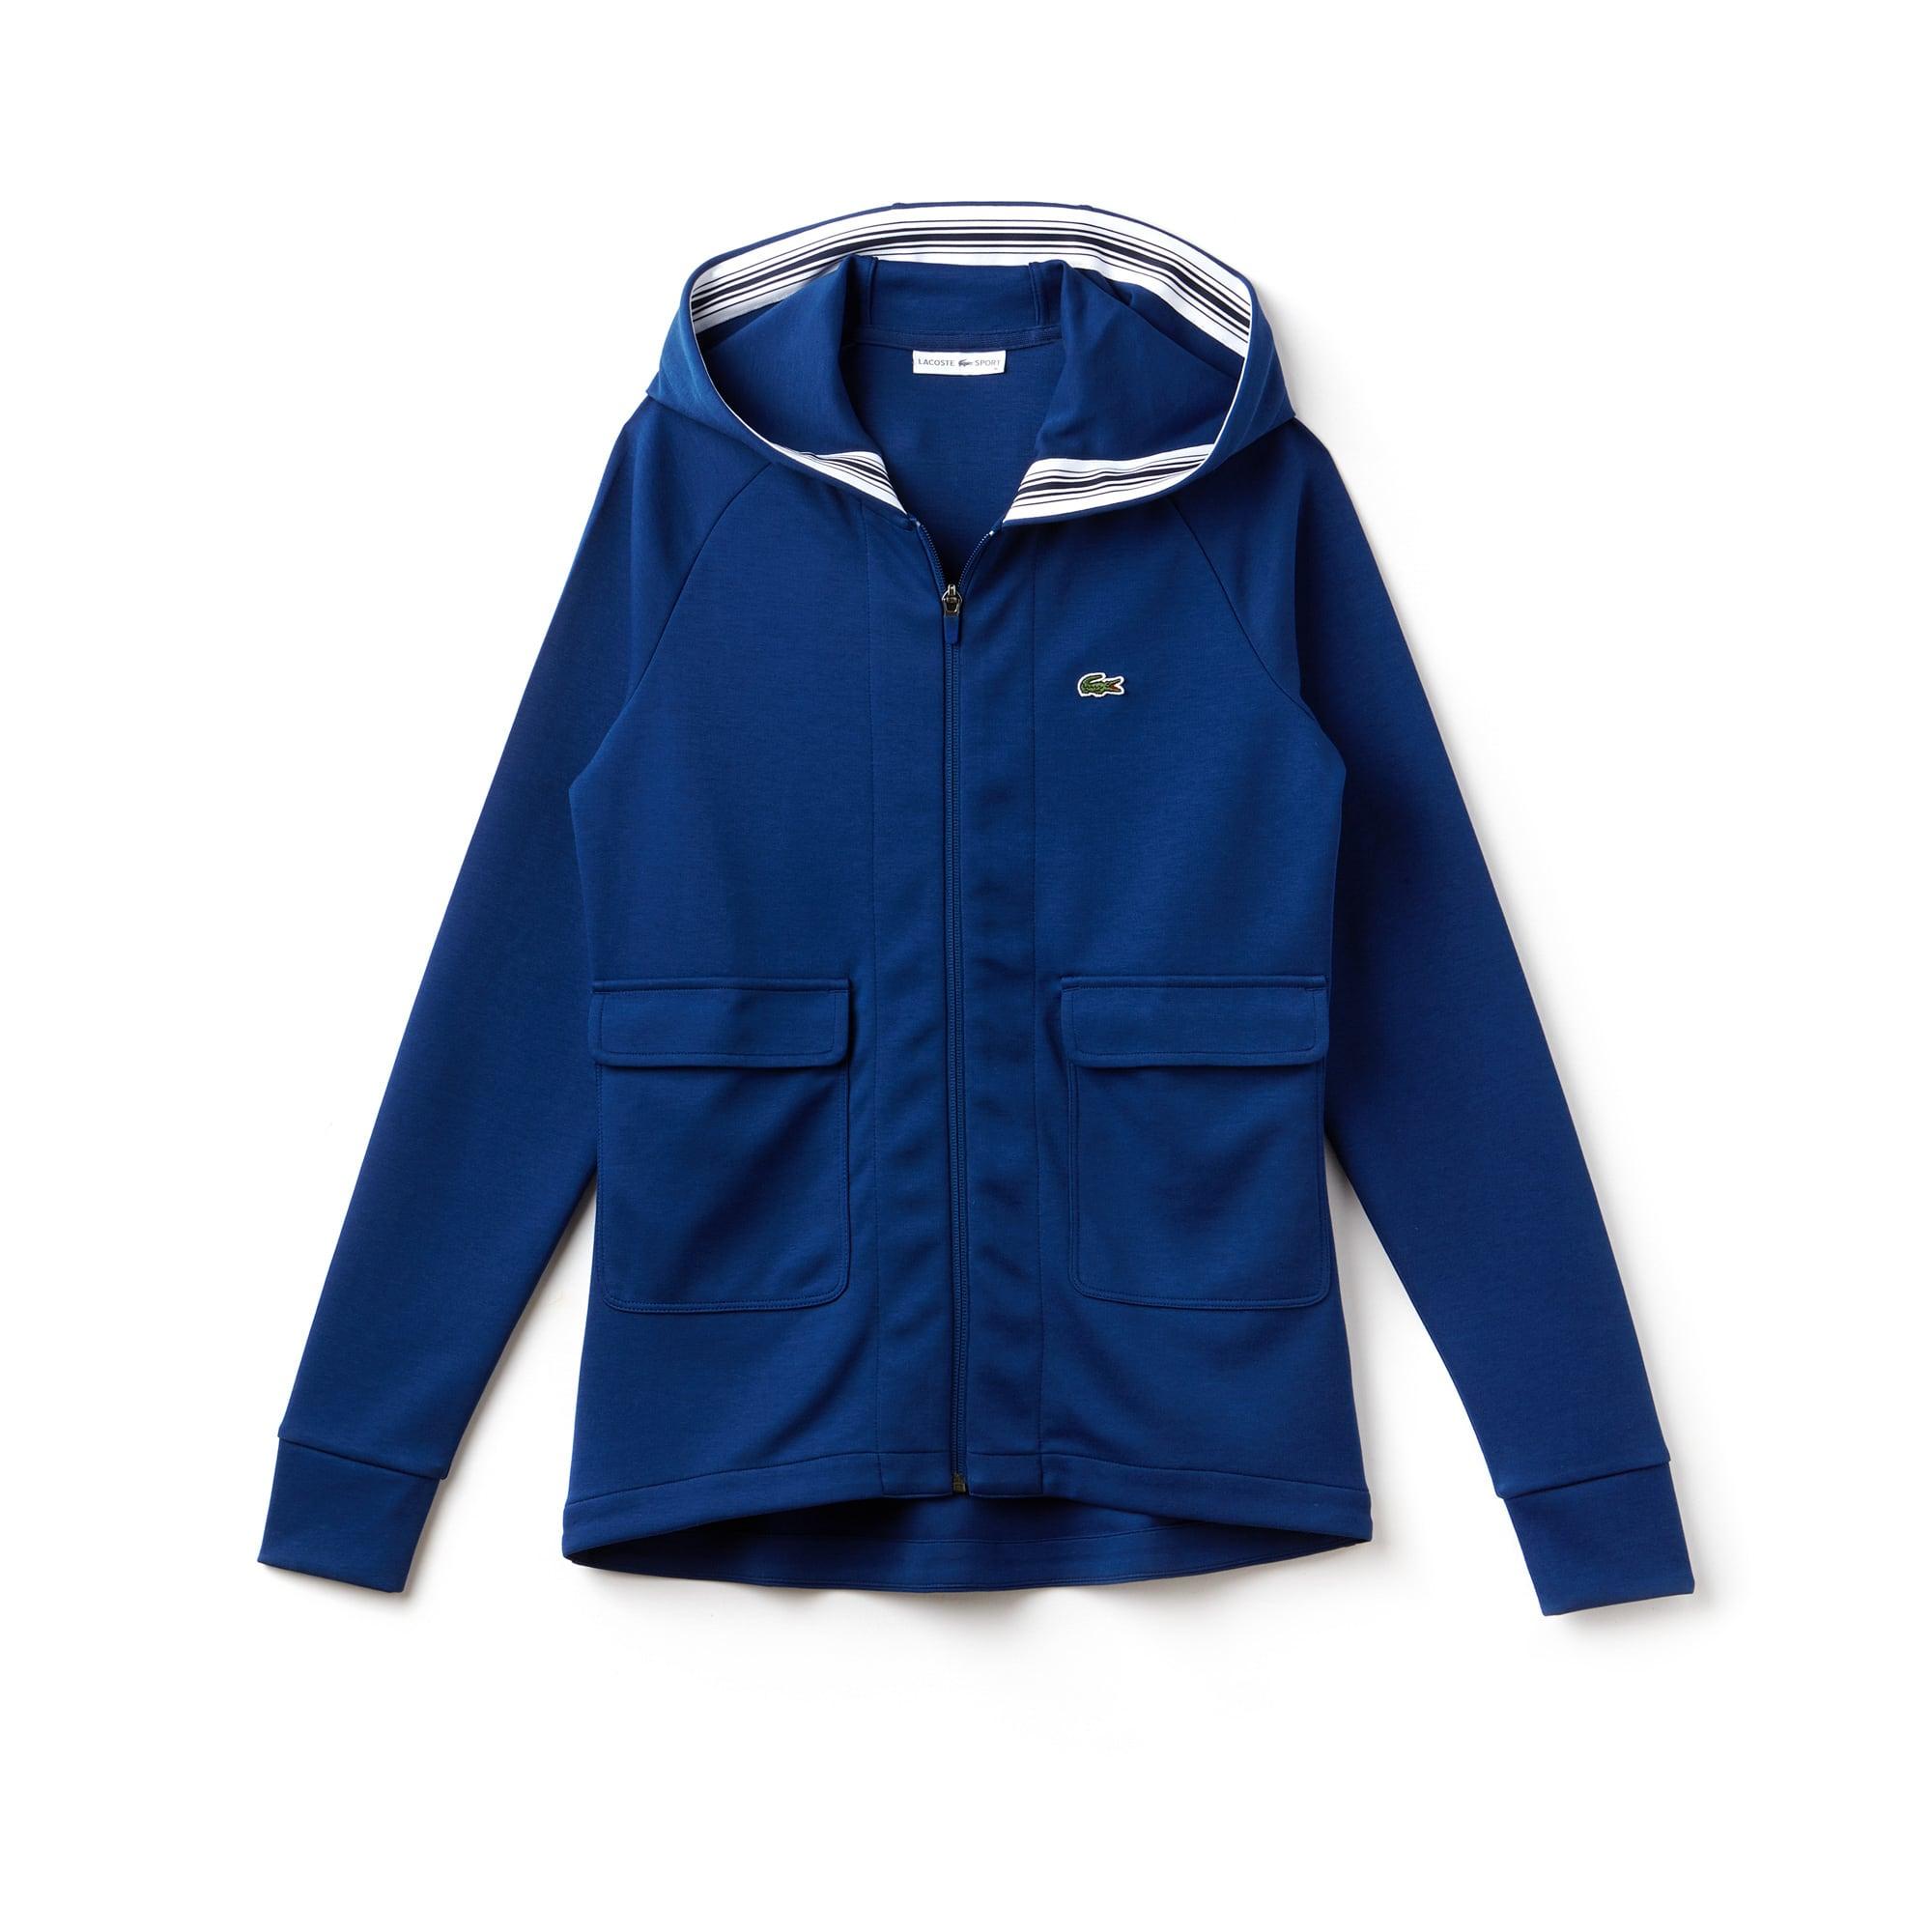 Damen LACOSTE SPORT Baumwoll Tennis-Sweatshirt mit Kapuze